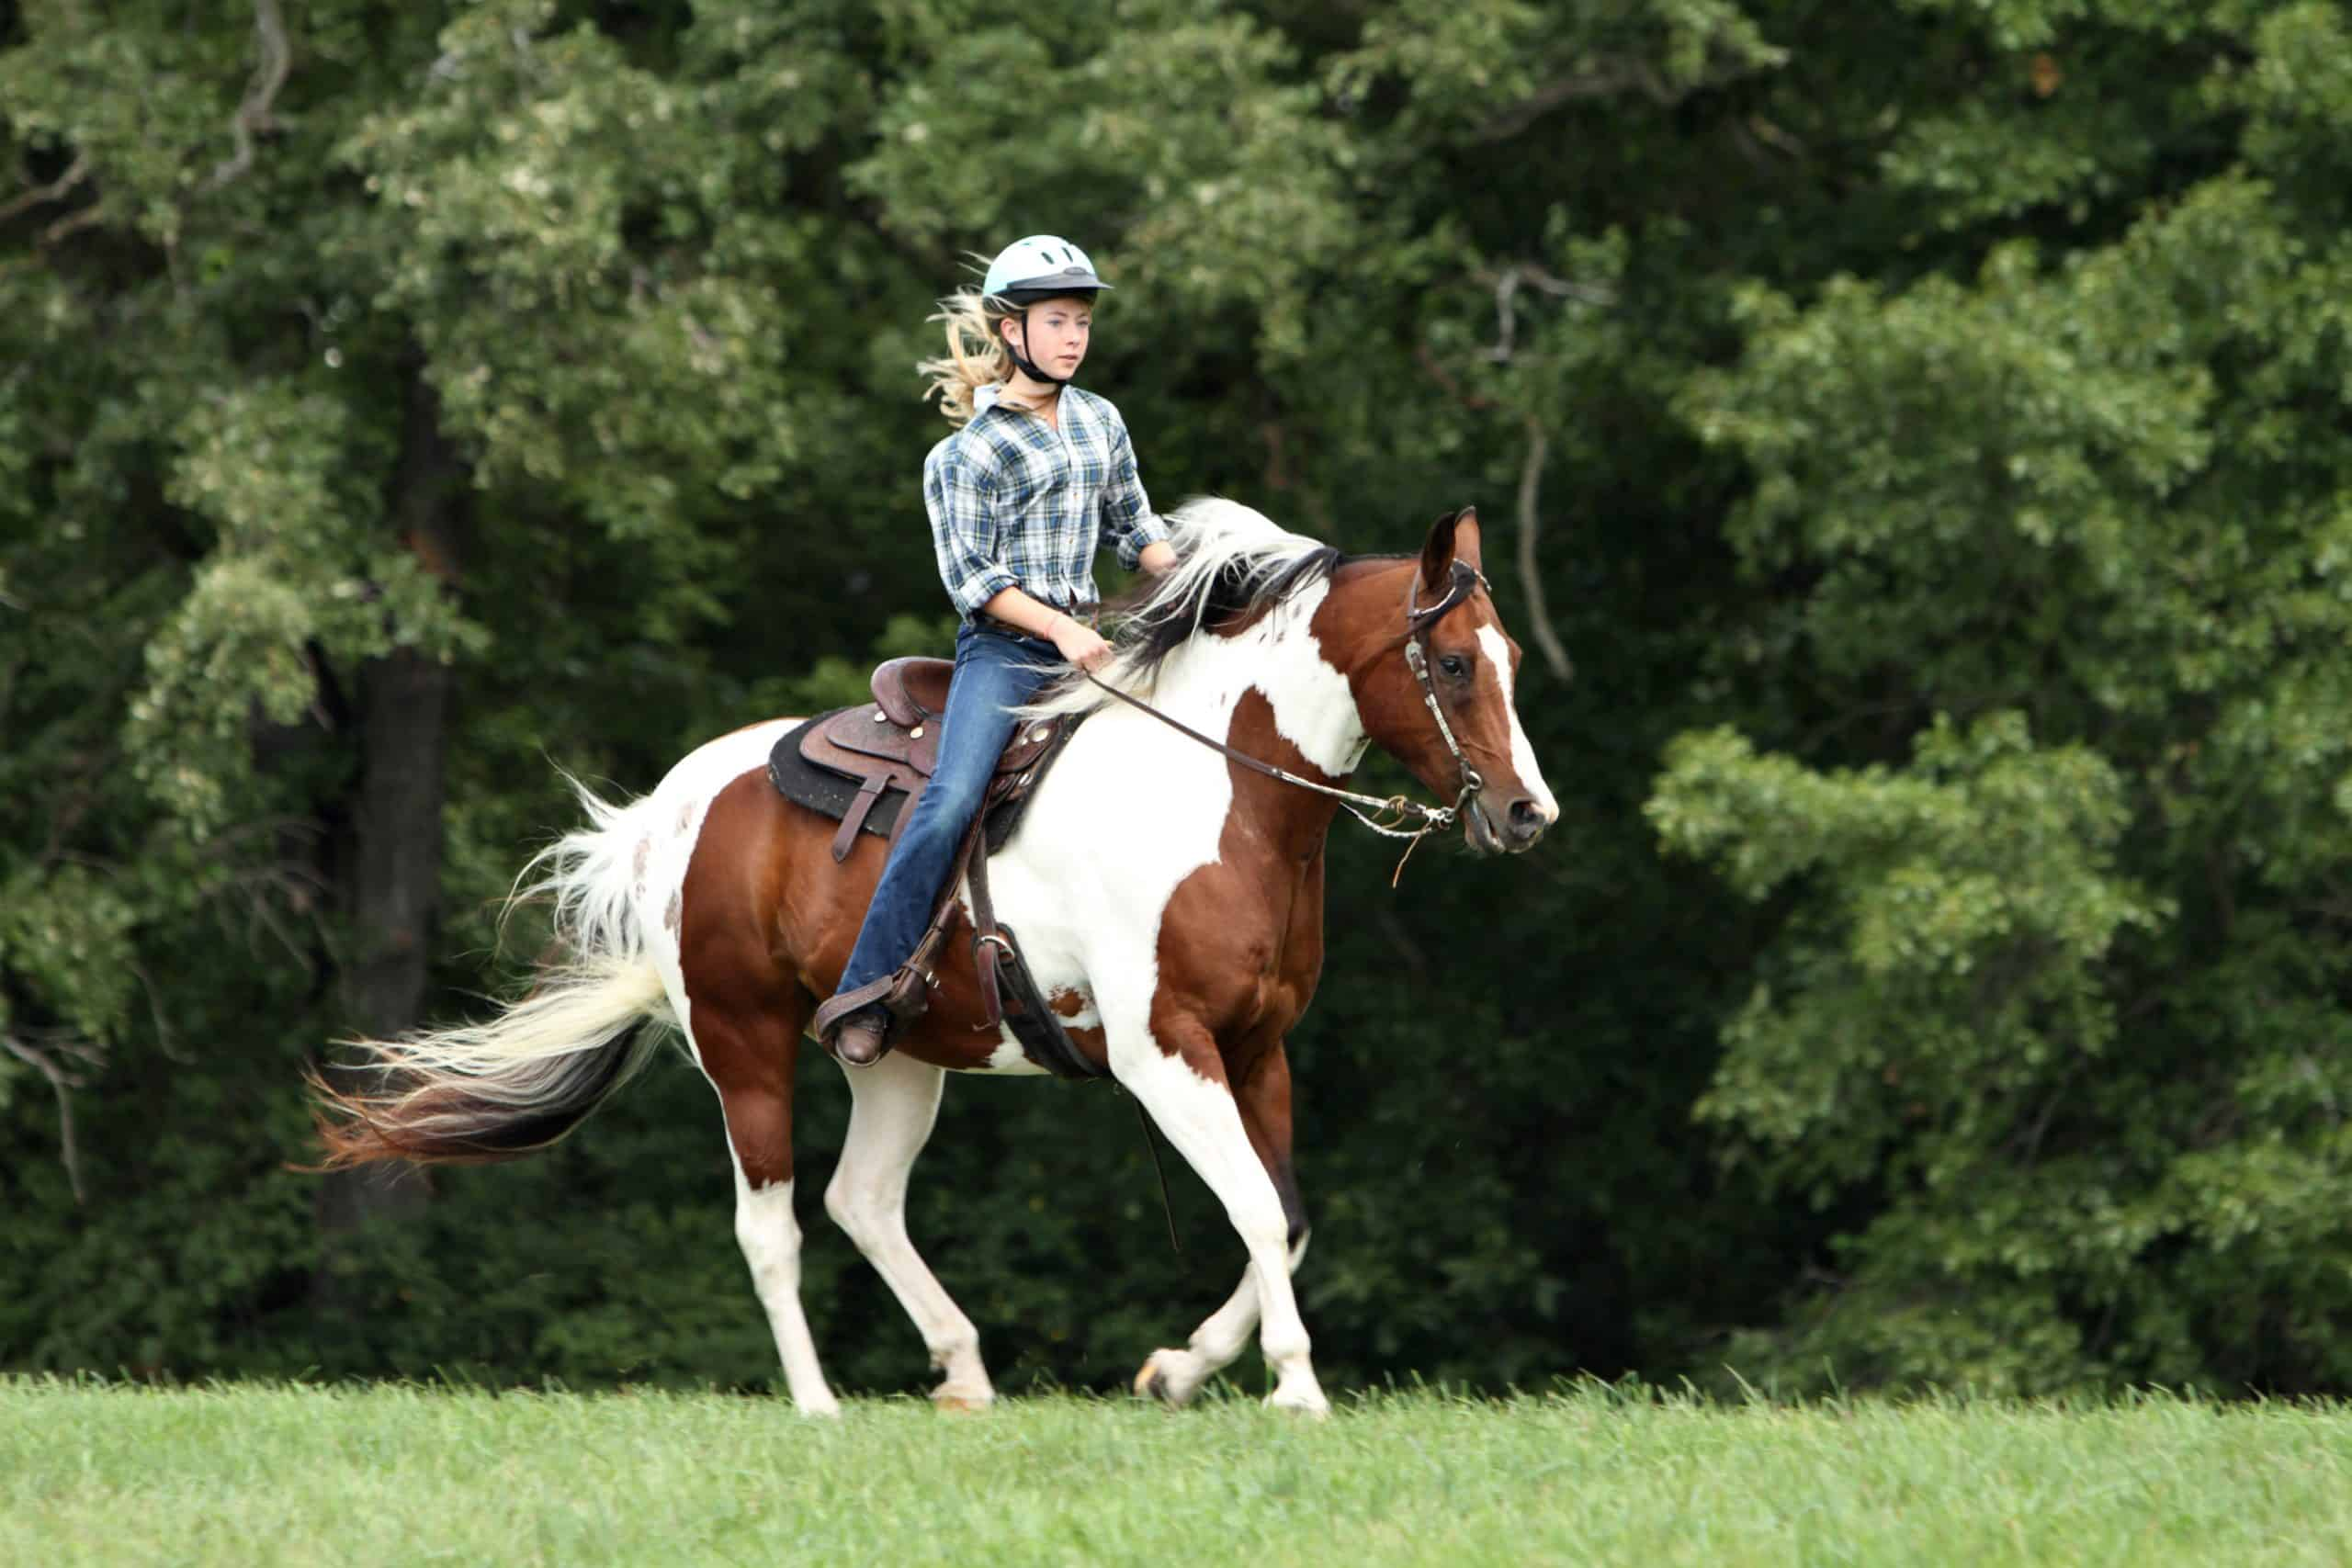 Teenage girl riding a running horse